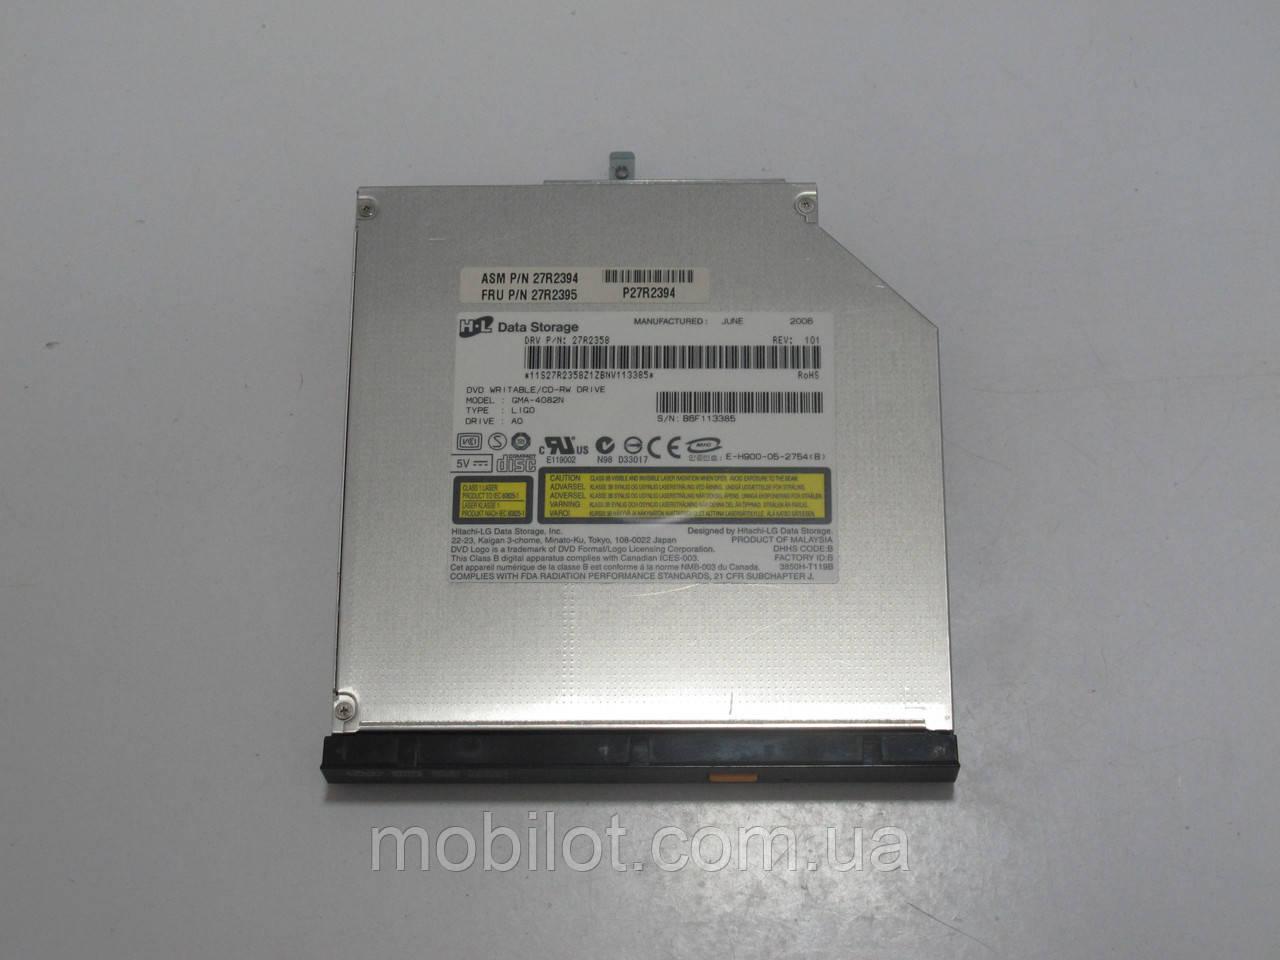 Оптический привод Lenovo 3000 C100 (NZ-6775)